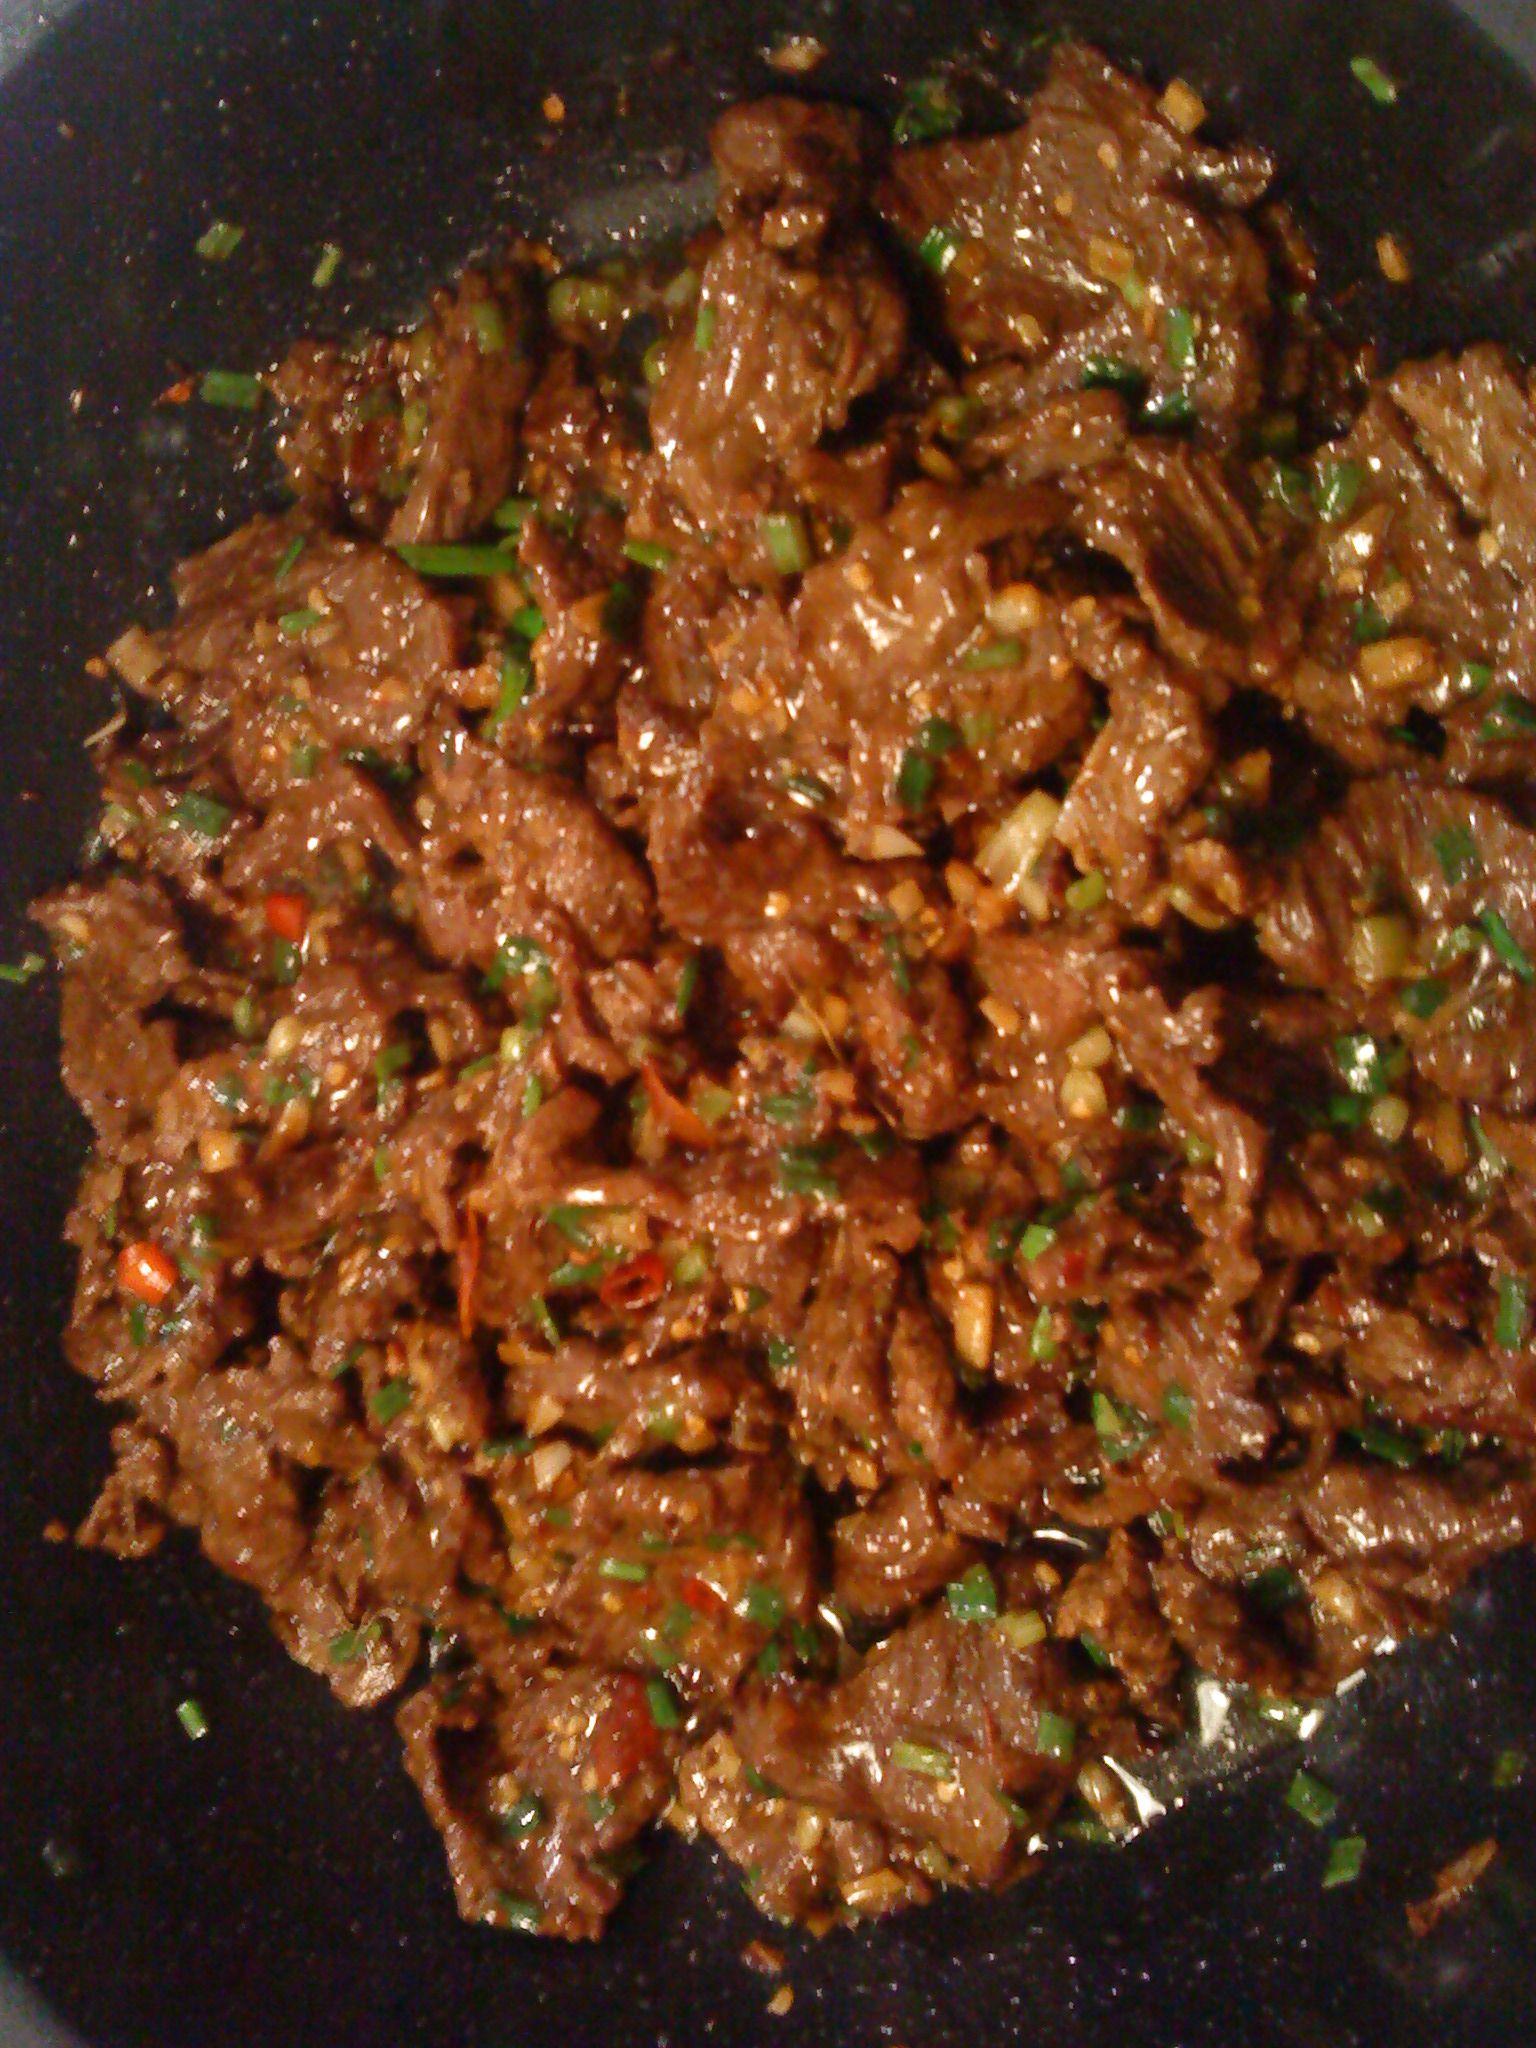 Beef with cumin zi ran niu rou chinese food recipes meat dinner chinese food recipes beef with cumin zi ran niu rou asian food adventures forumfinder Gallery